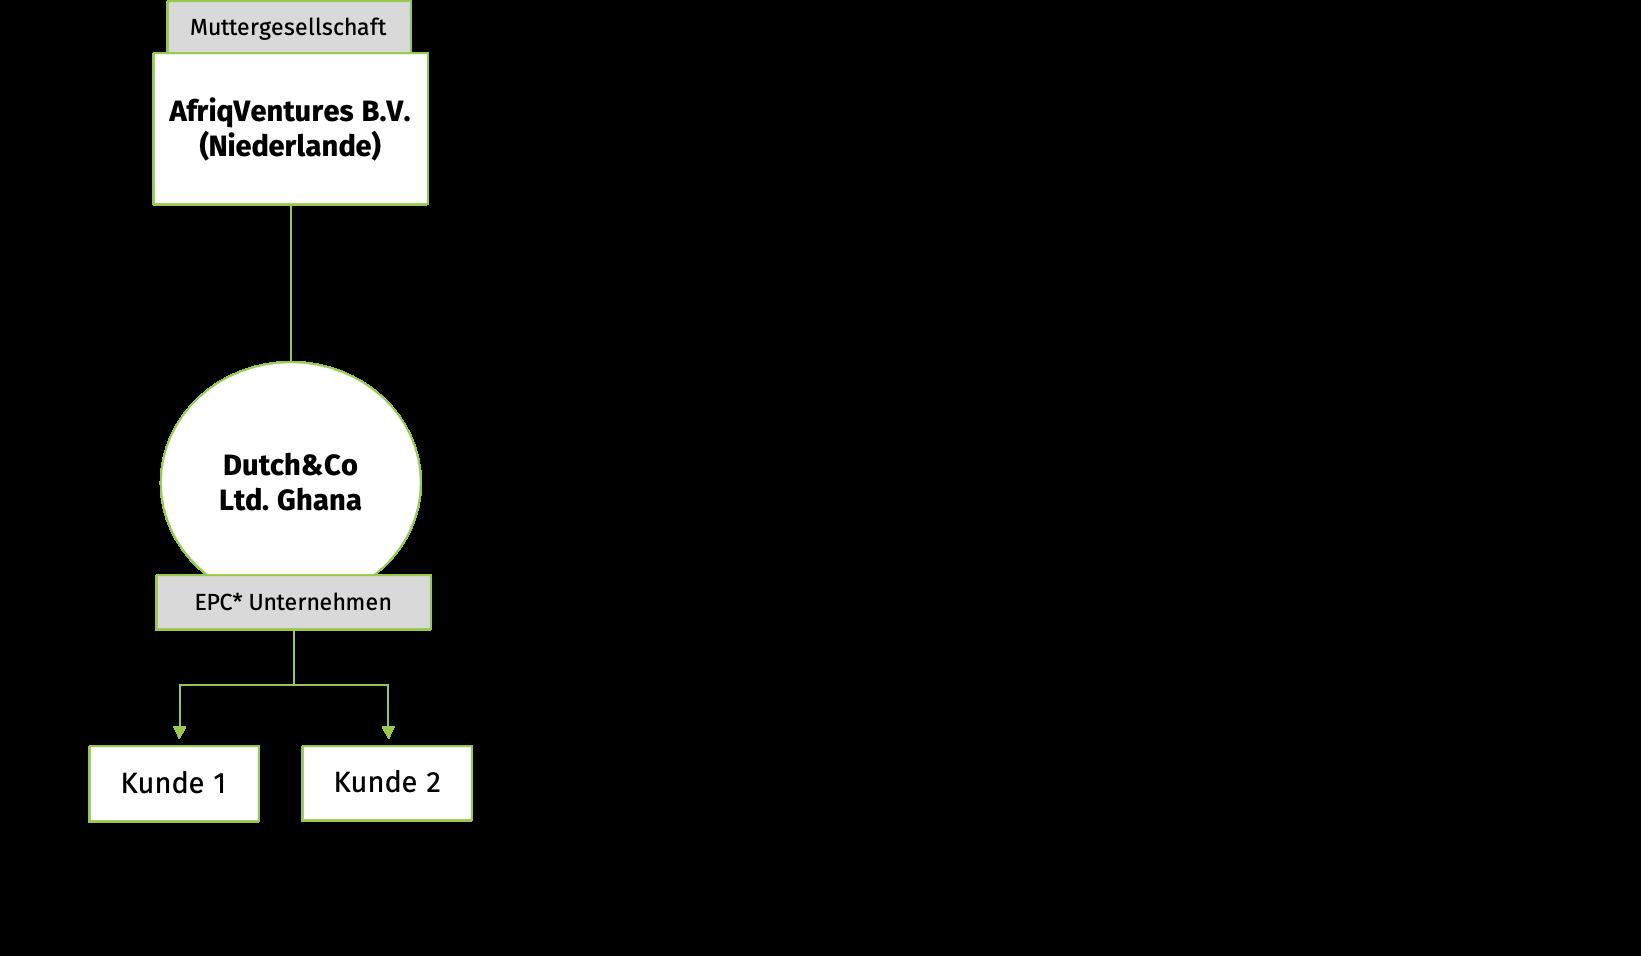 Firmenstruktur Dutch&Co